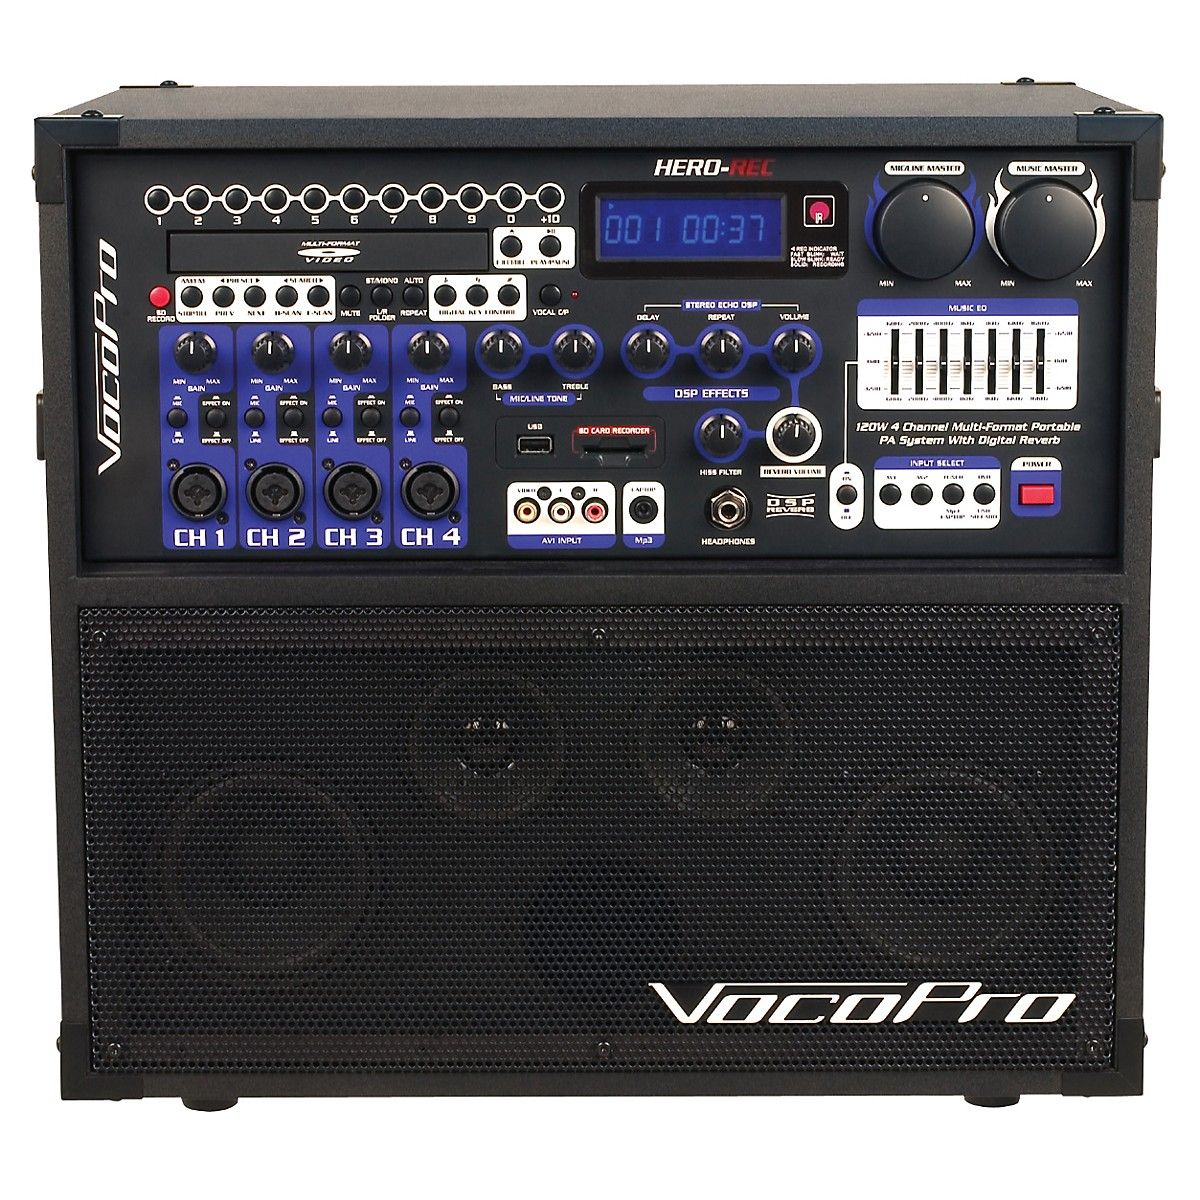 VocoProHERO-REC Multi-Format Portable P.A. Karaoke System w/ Digital Recorder